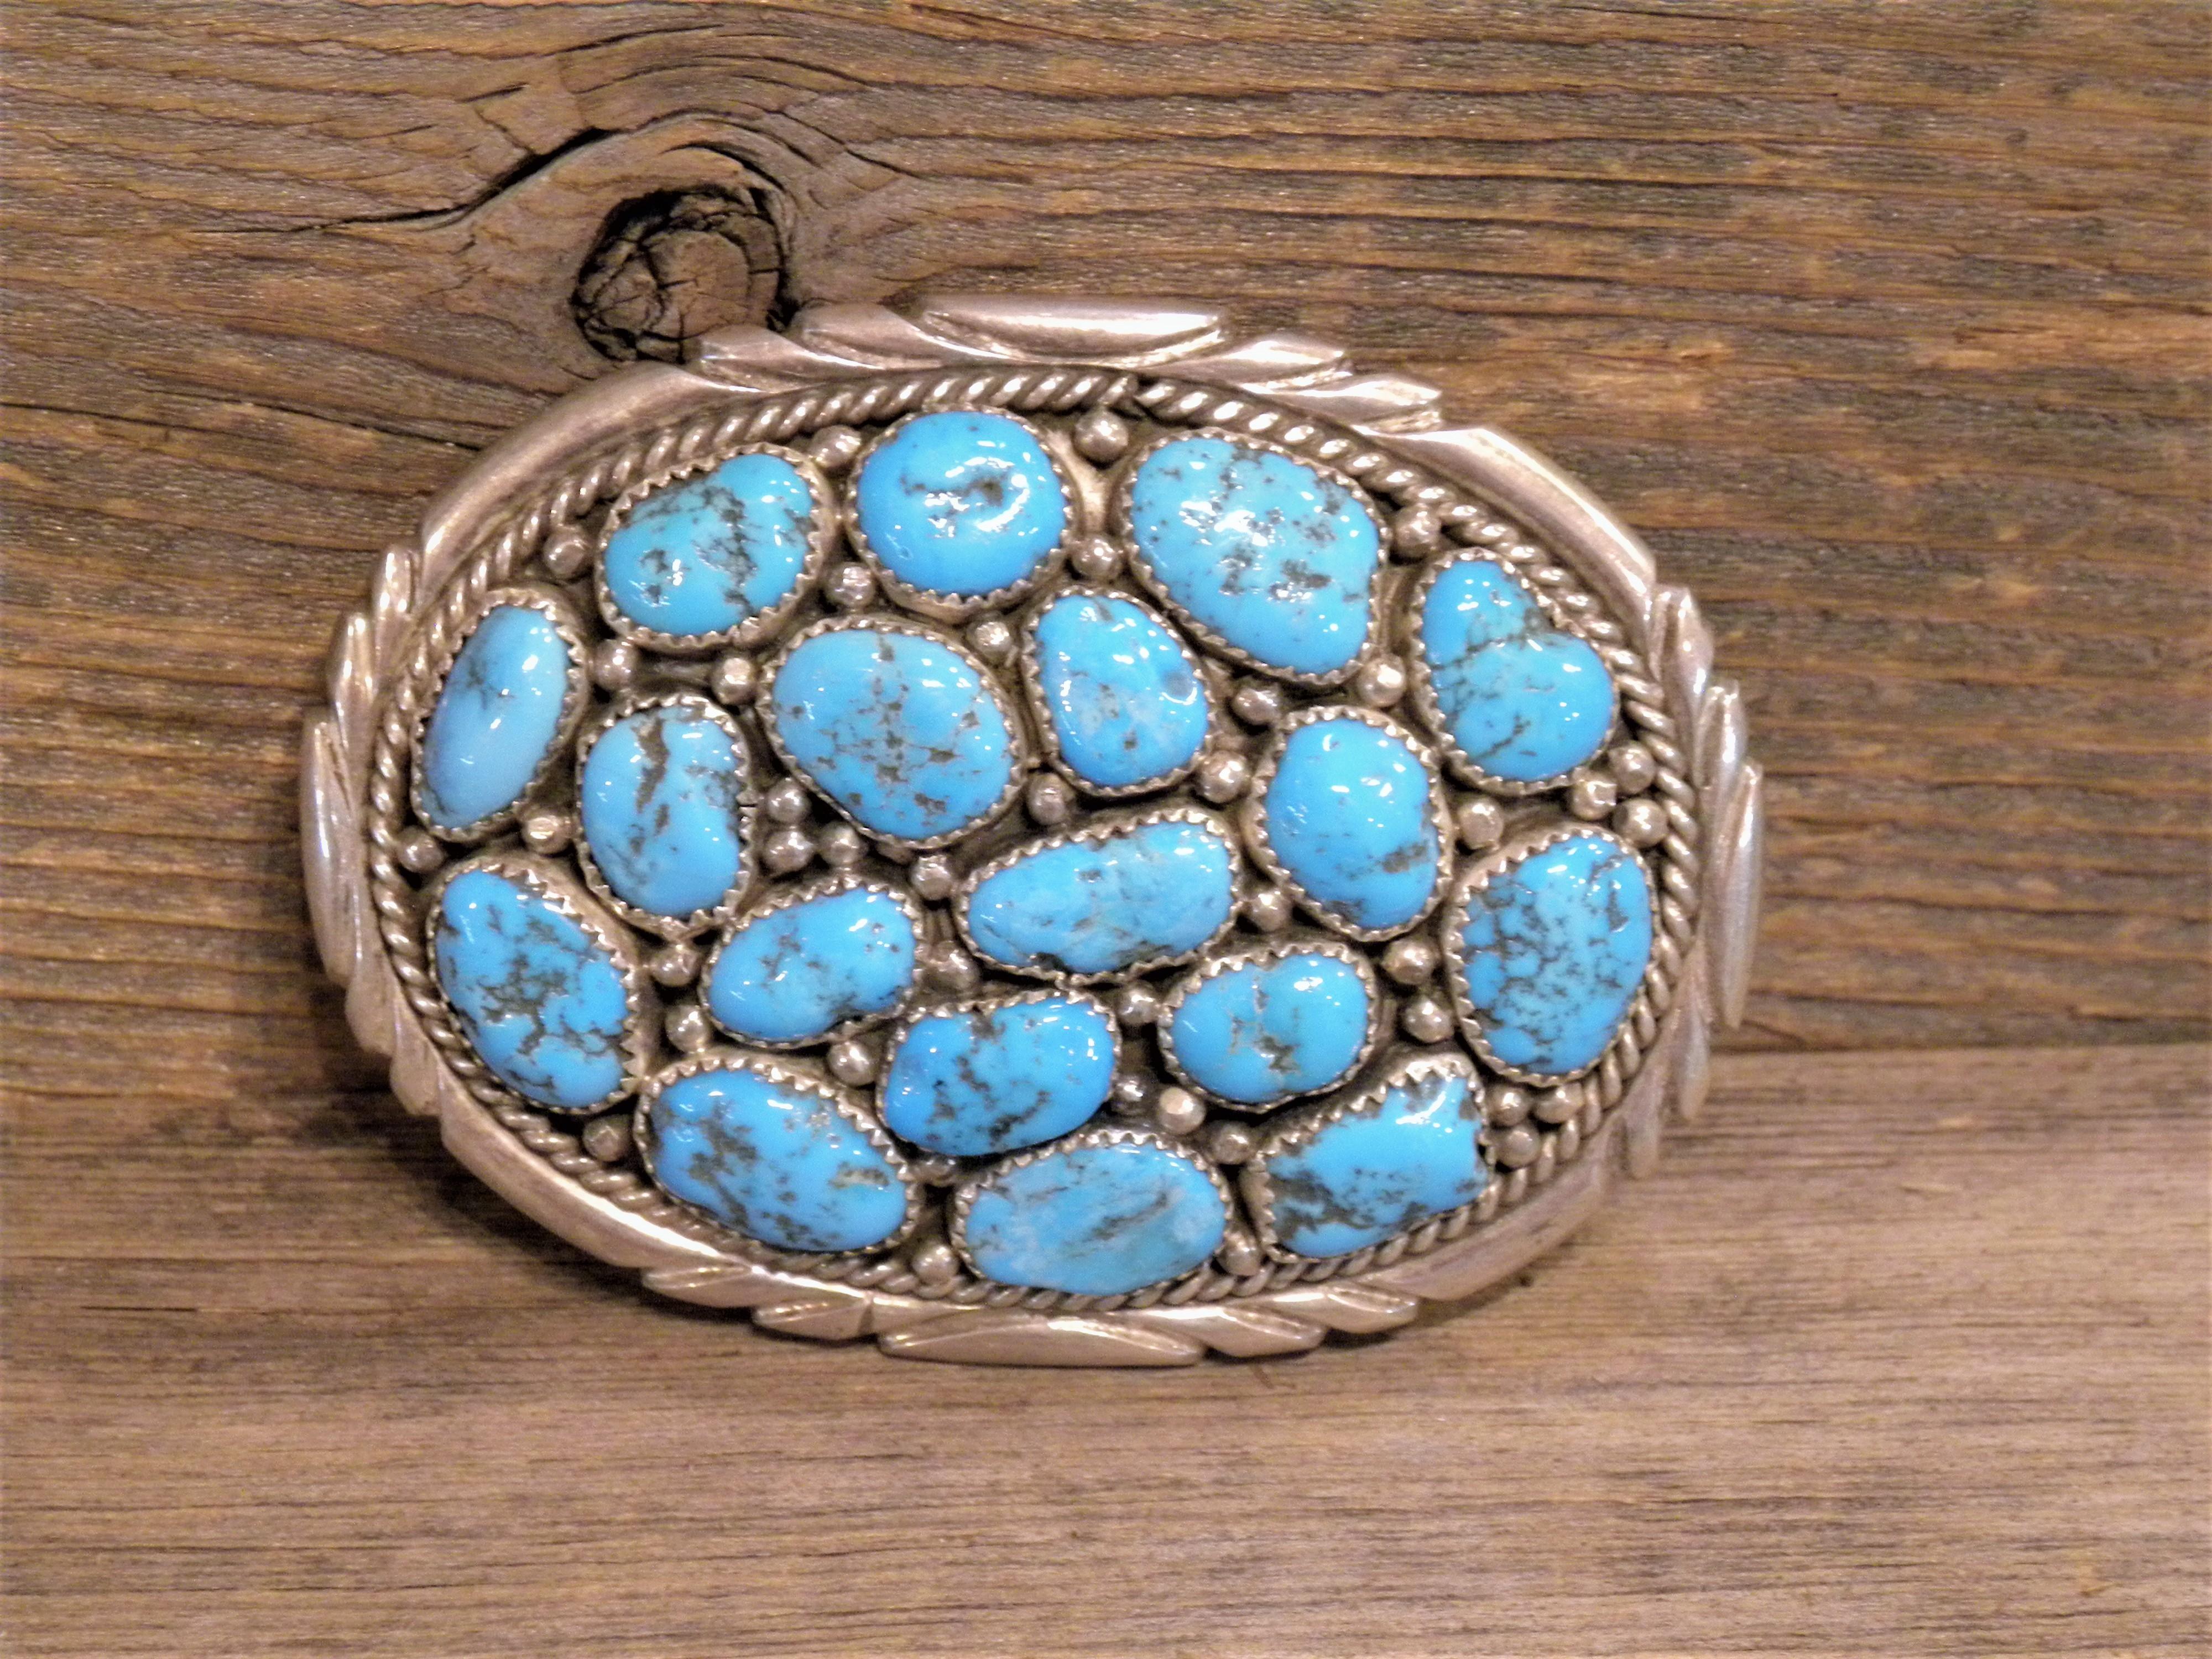 BB4 Pawn Navajo Handmade Sleeping Beauty Turquoise Belt Buckle